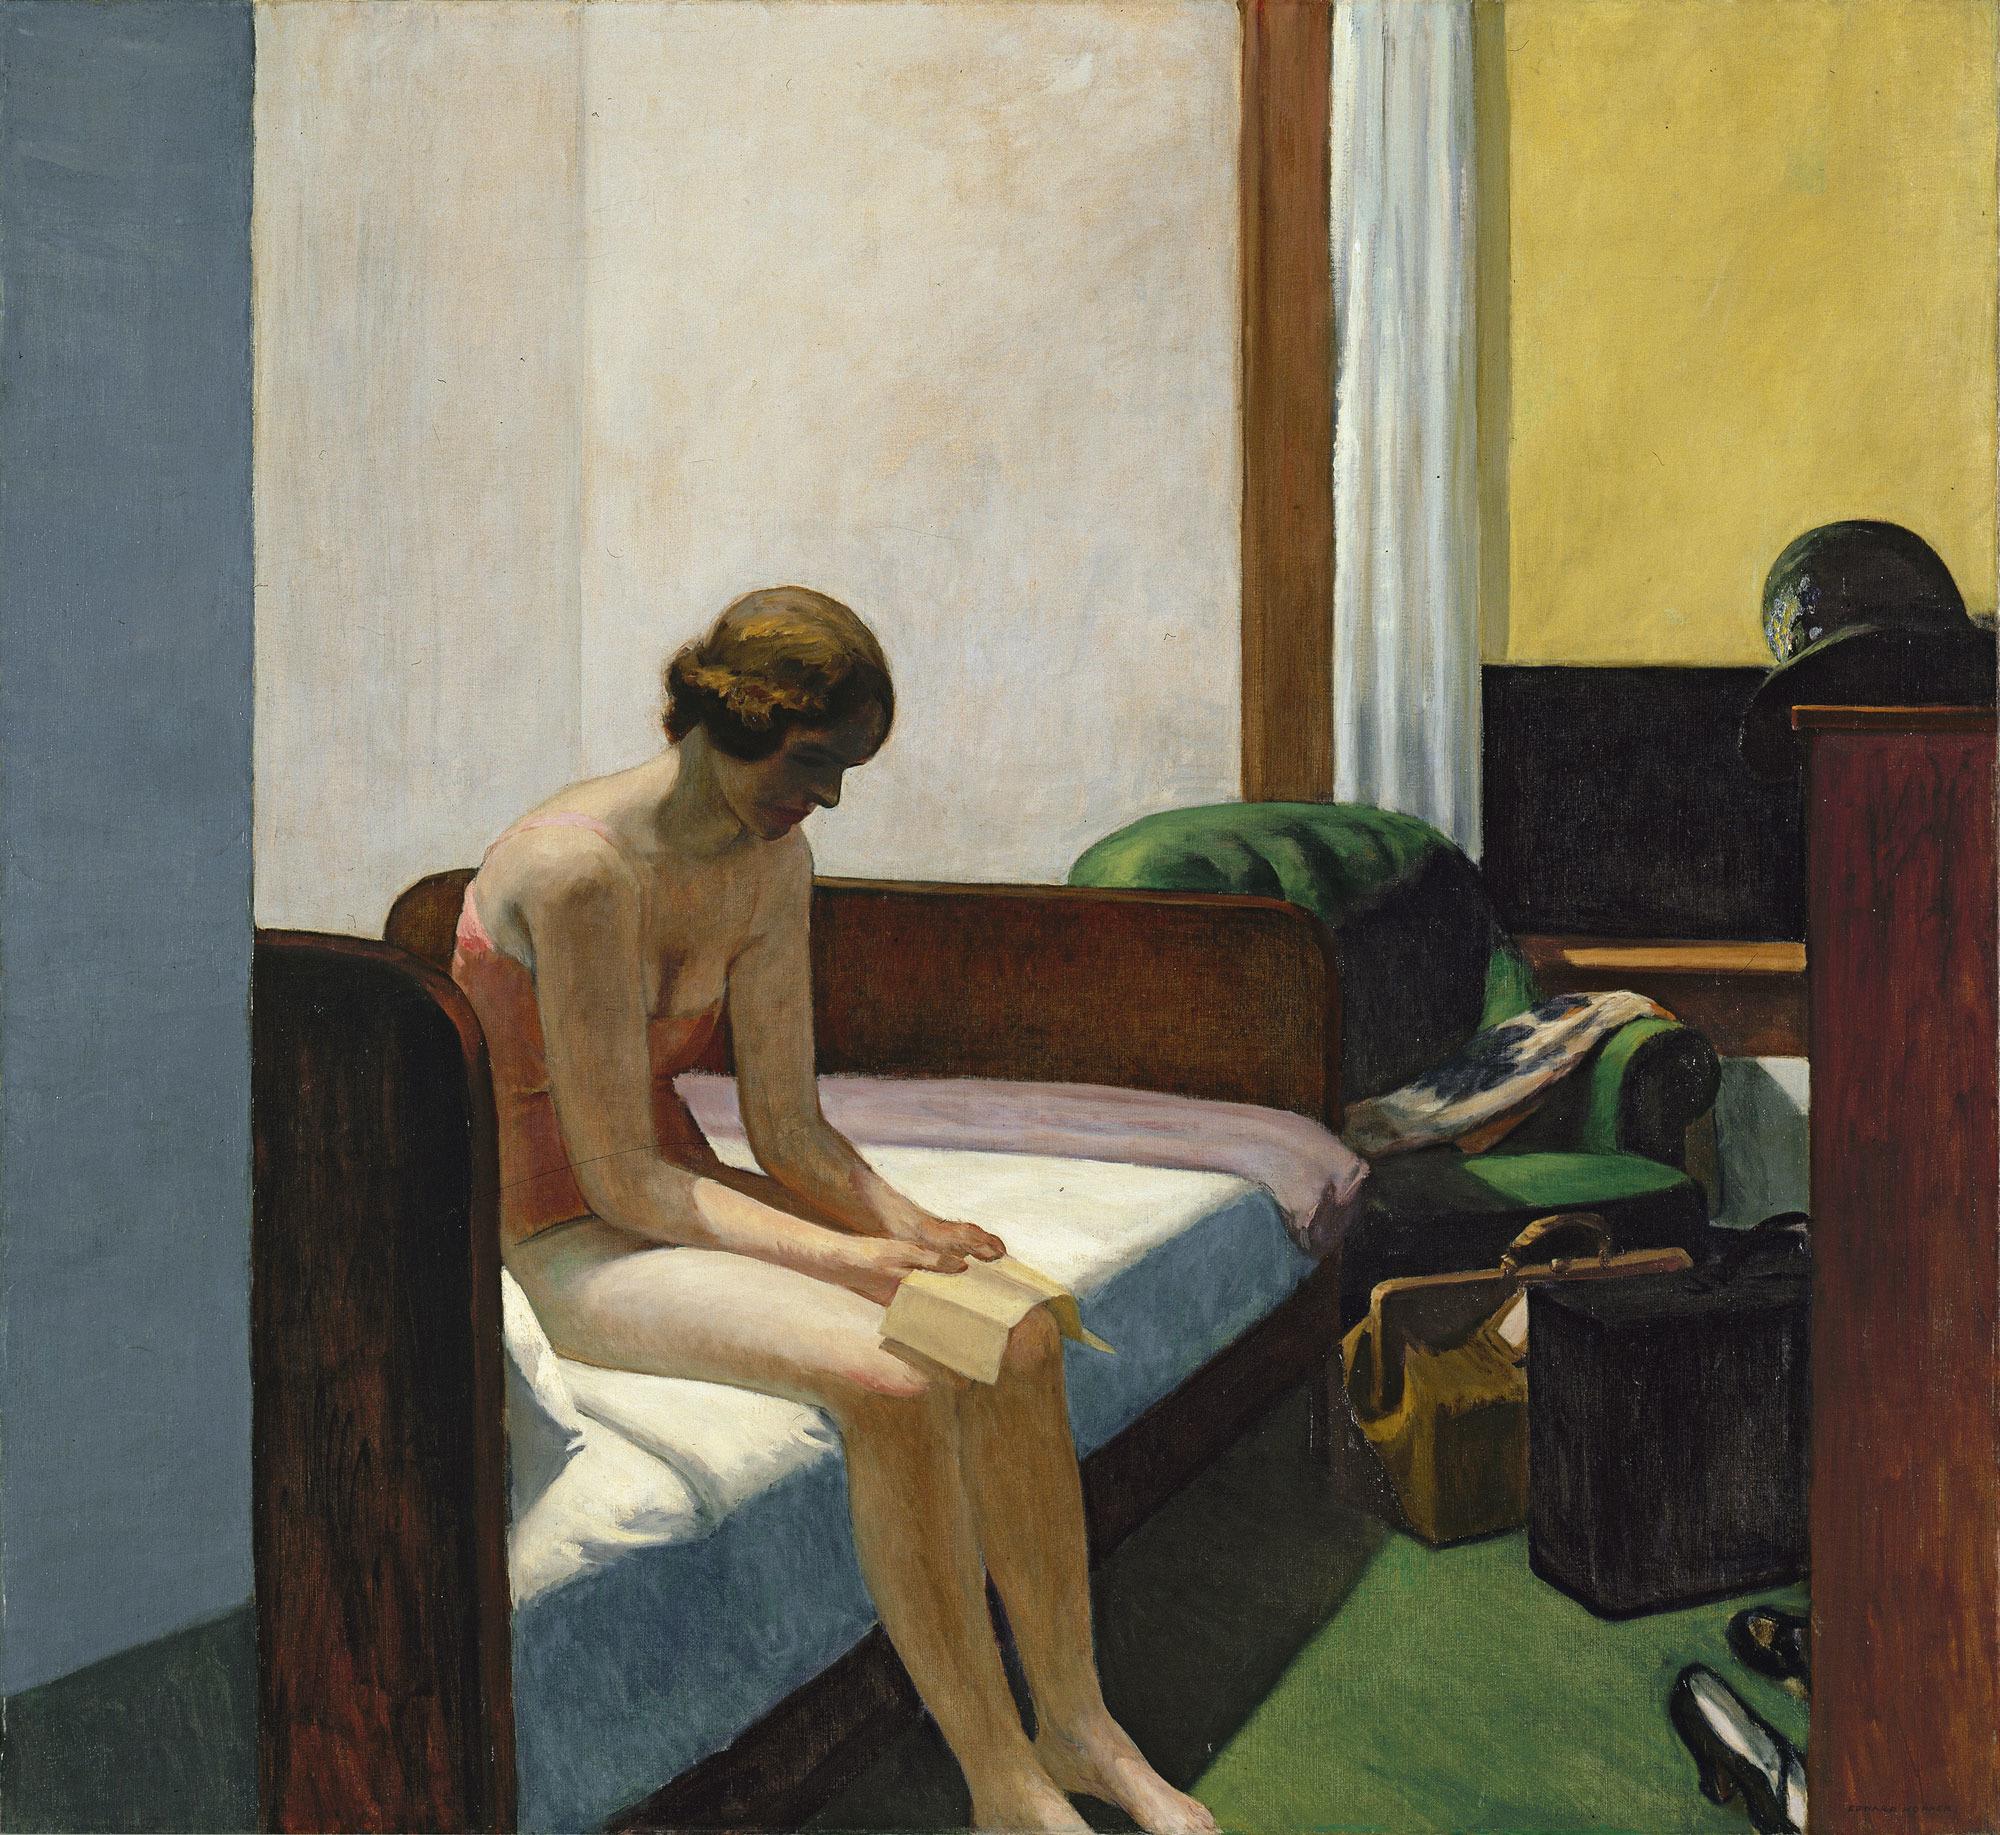 Hotel Room, Edward Hopper